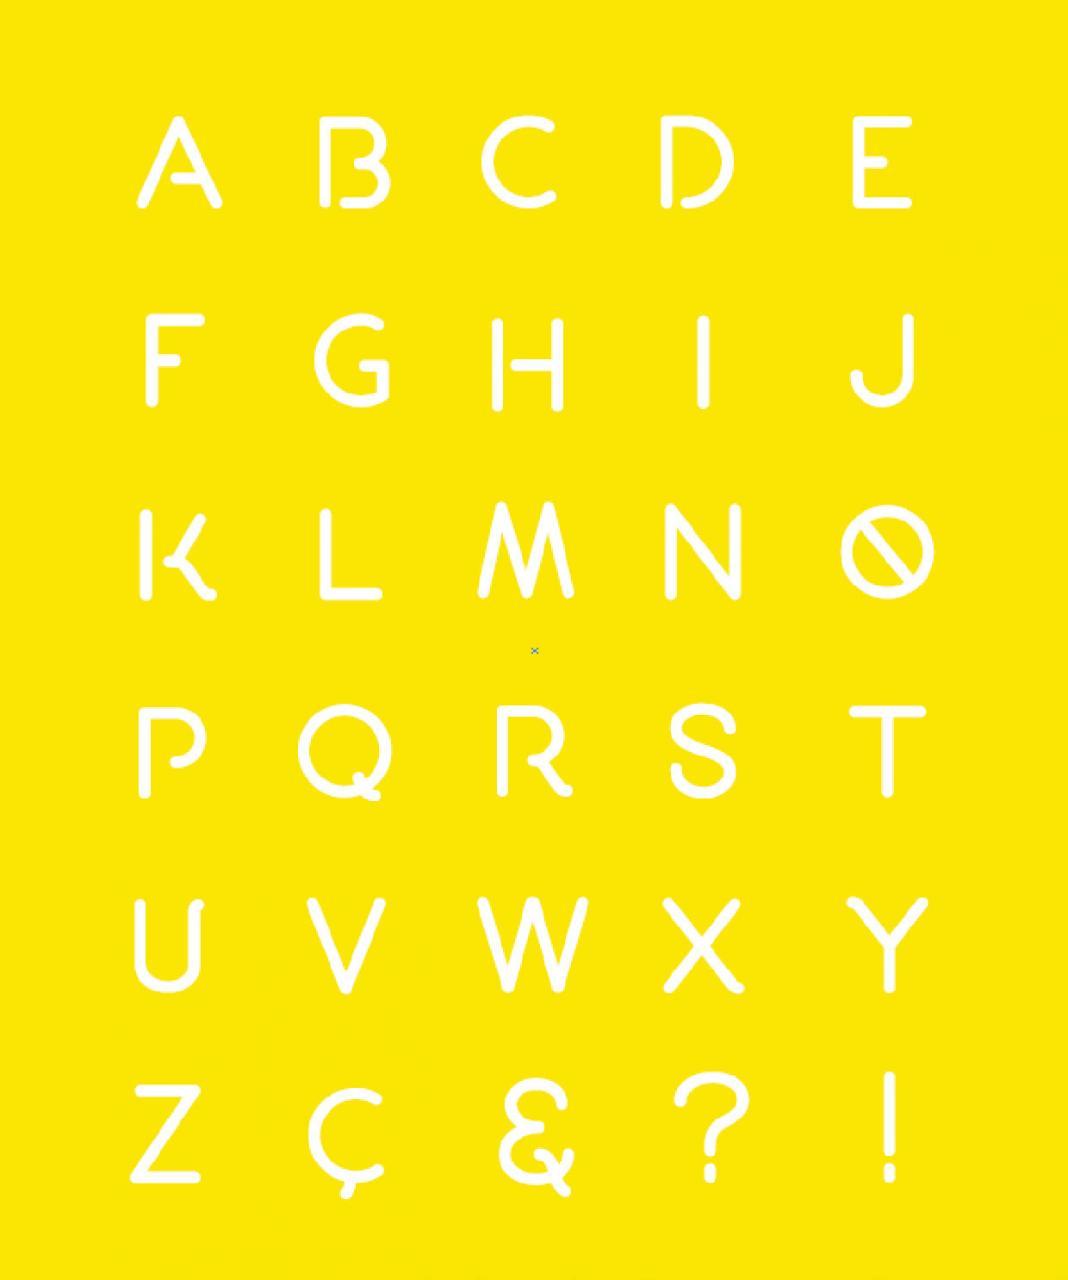 porto-best-free-logo-fonts-037